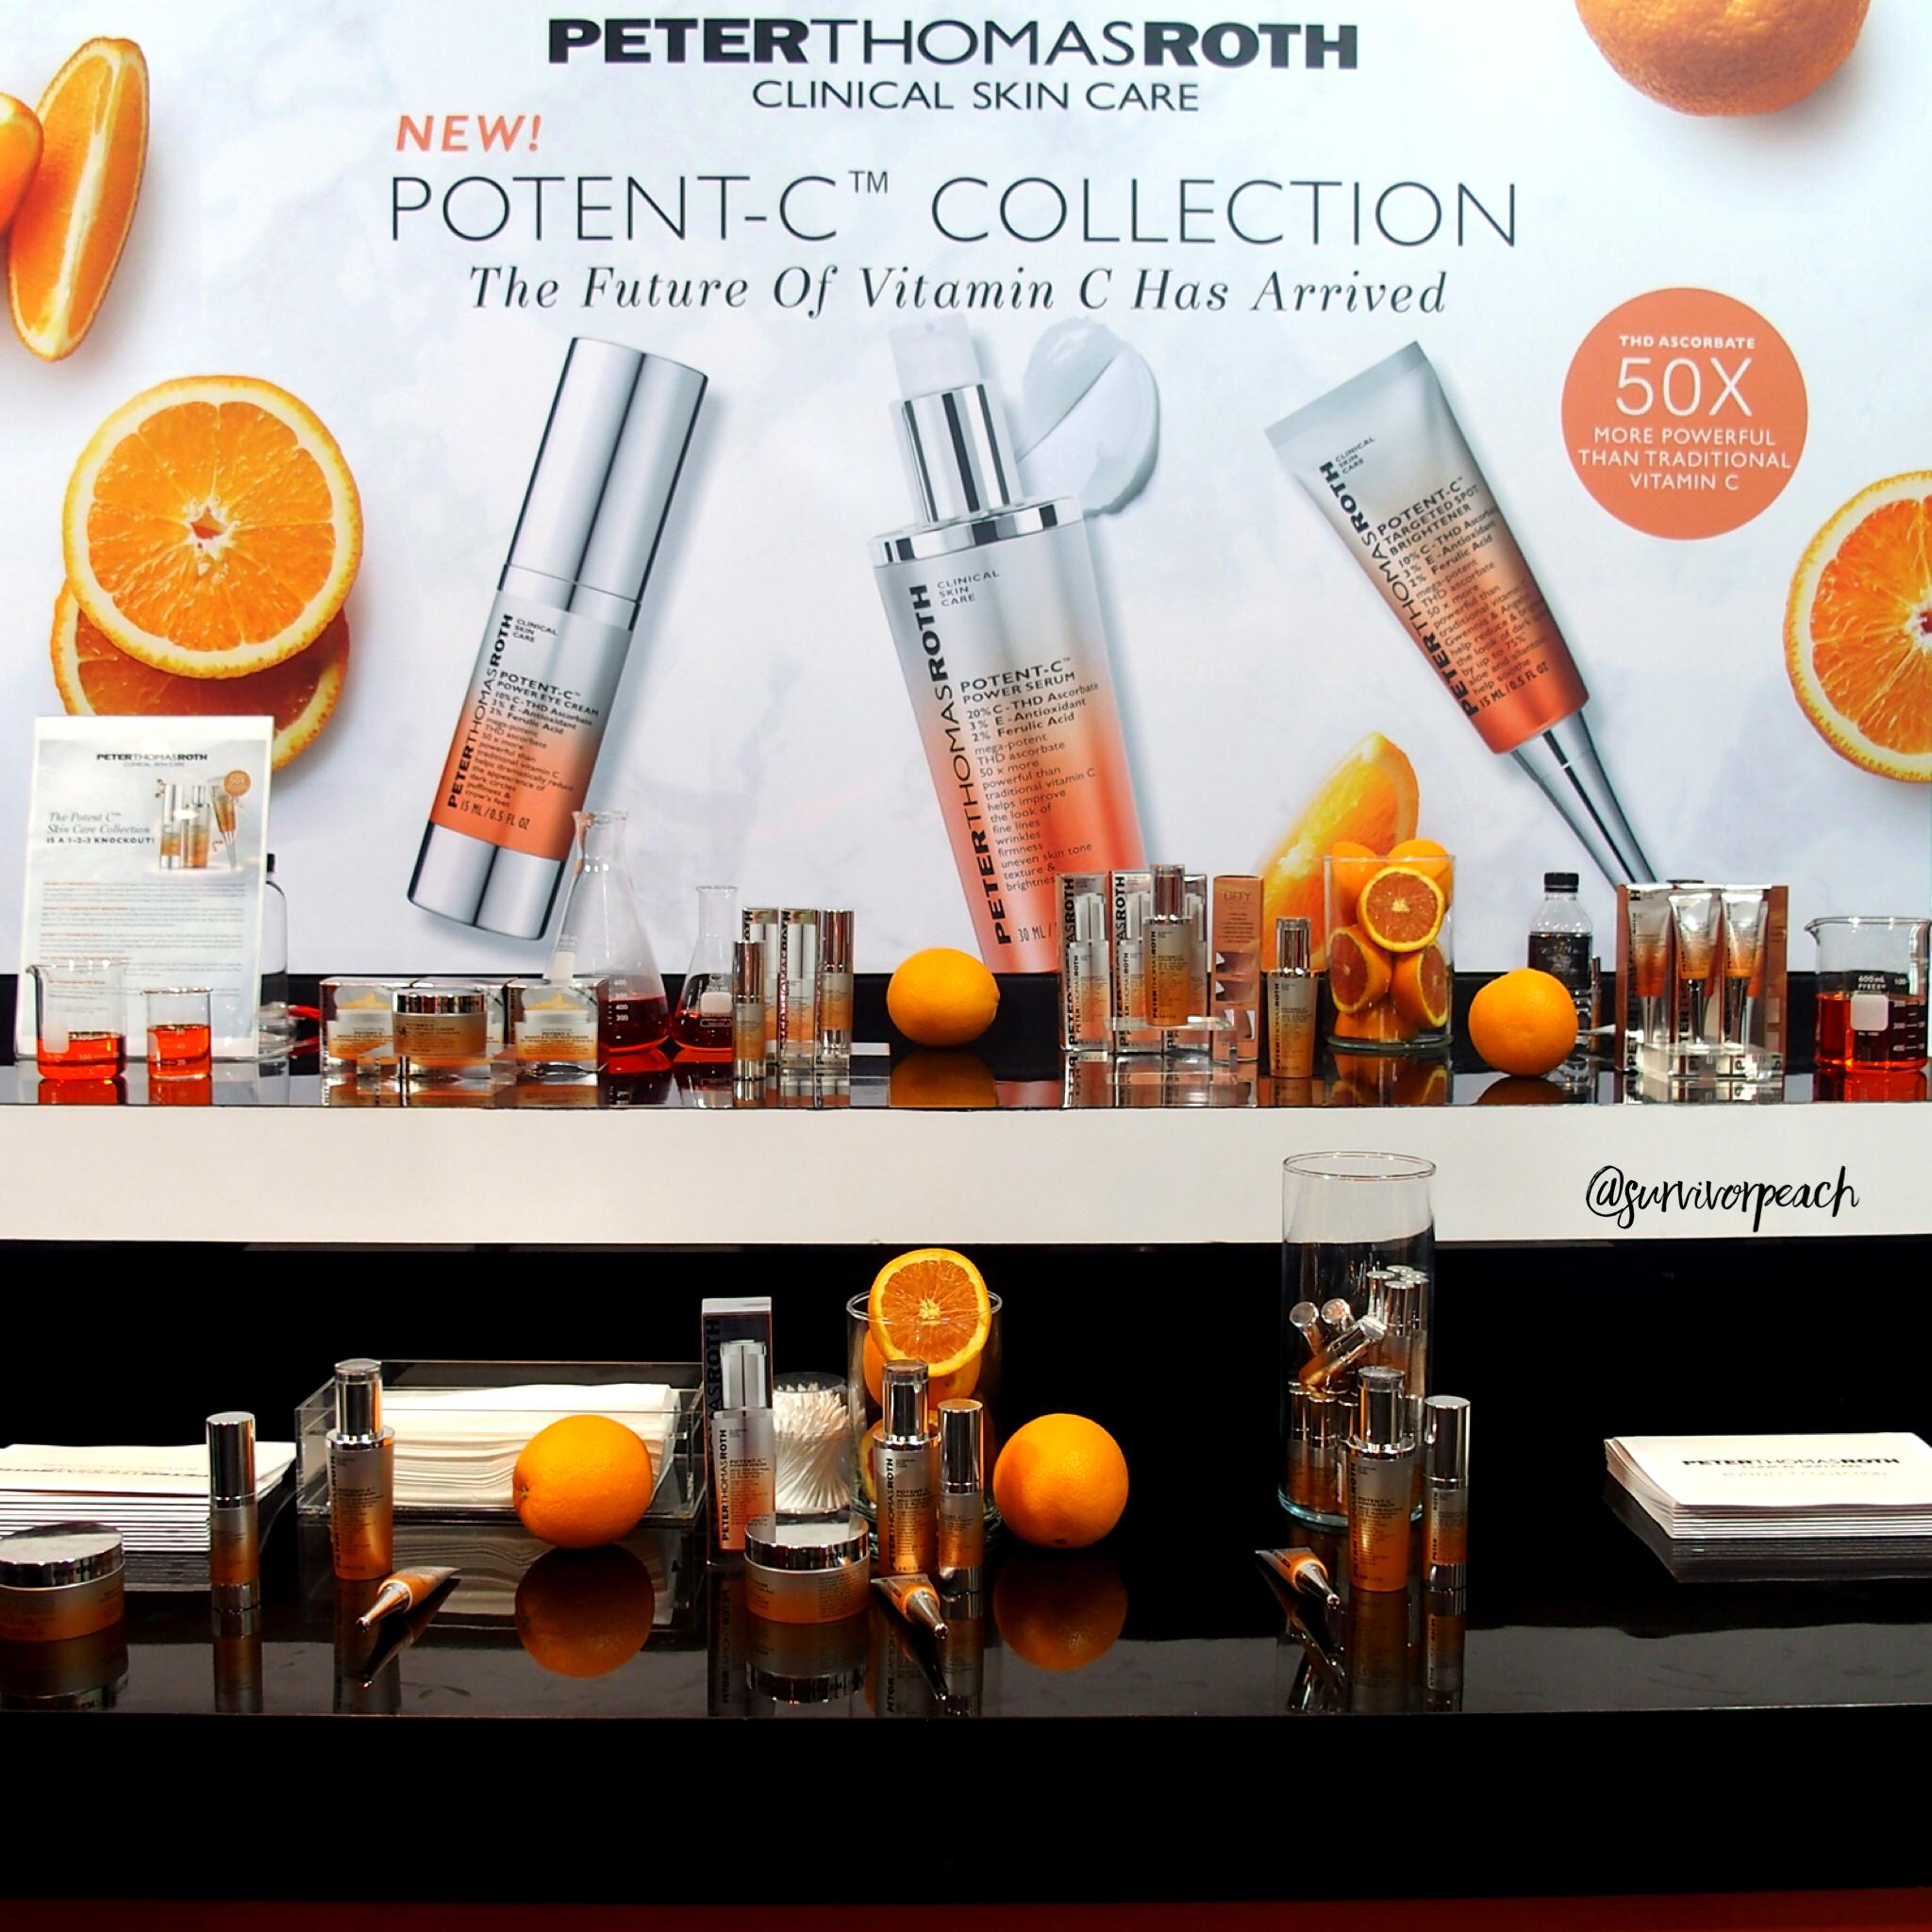 Peter Thomas Roth Potent-C Skincare Range